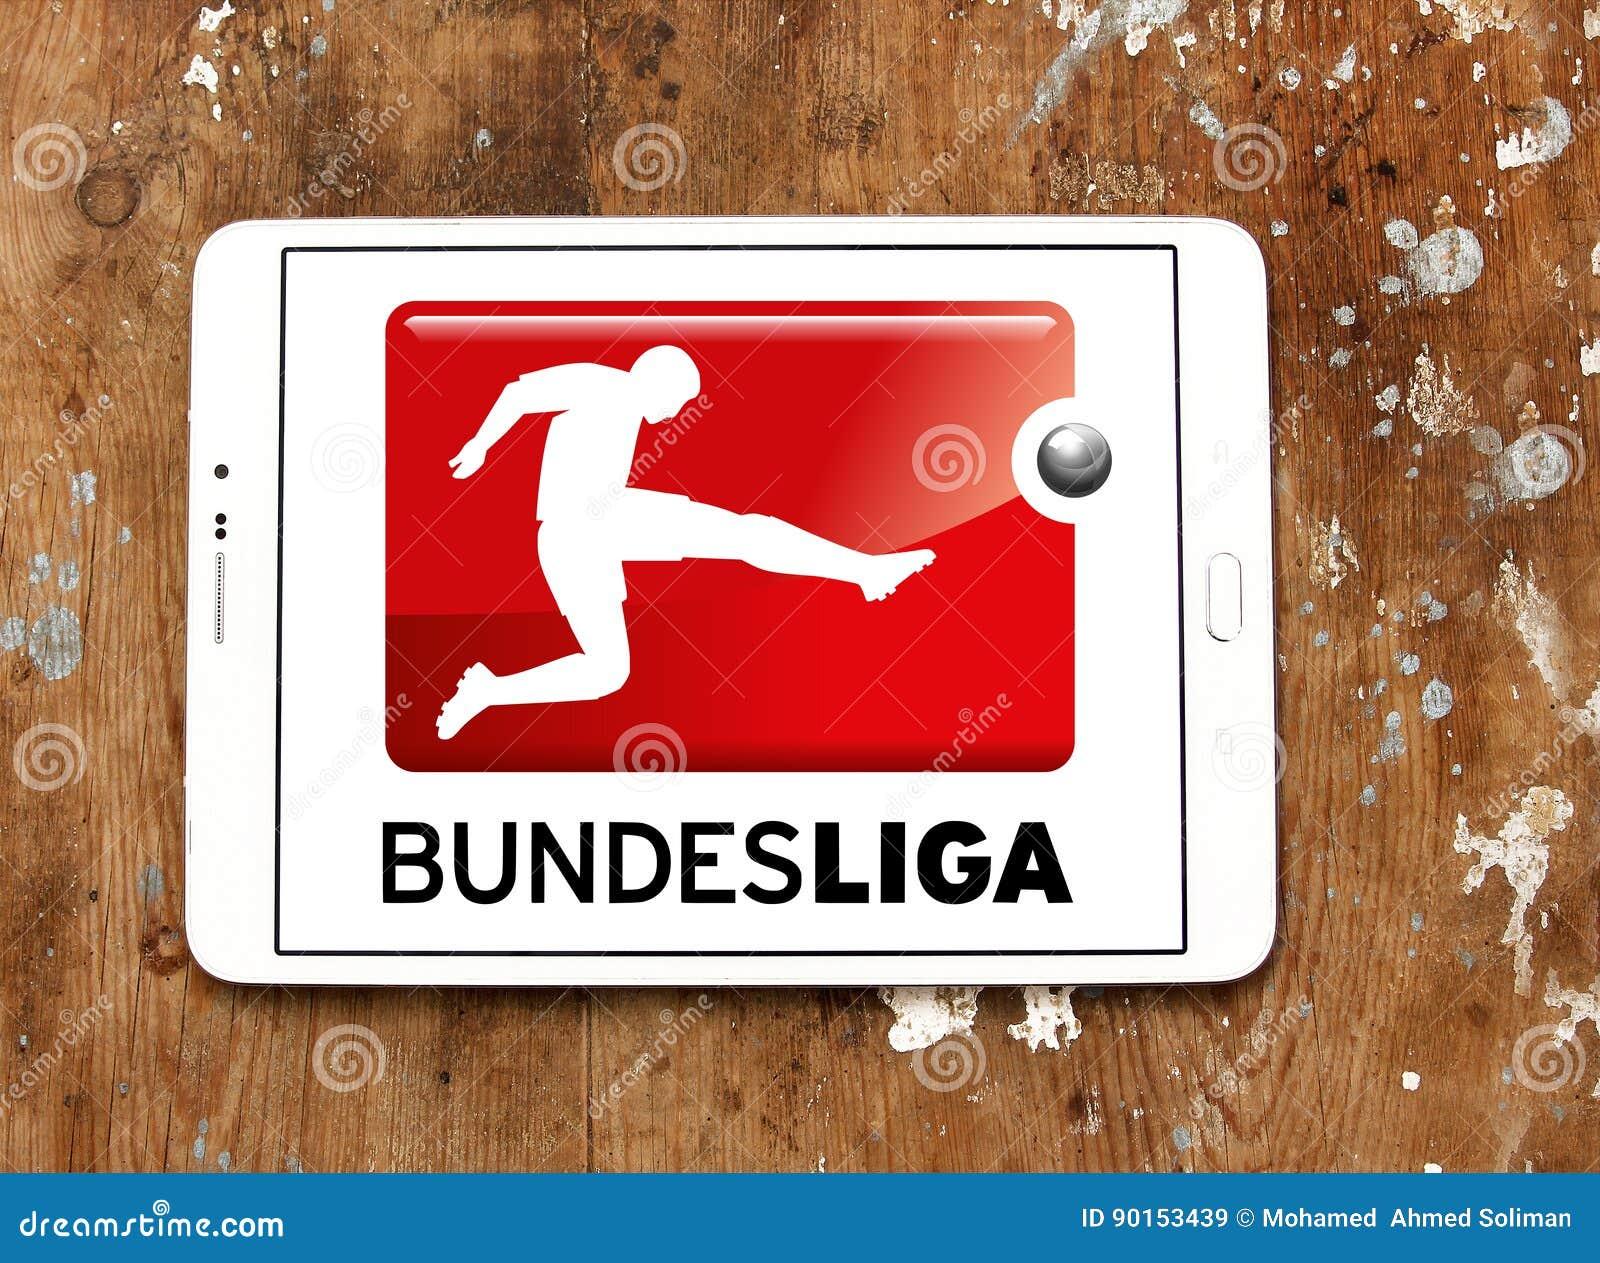 german bundesliga logo editorial stock image image of football 90153439 dreamstime com